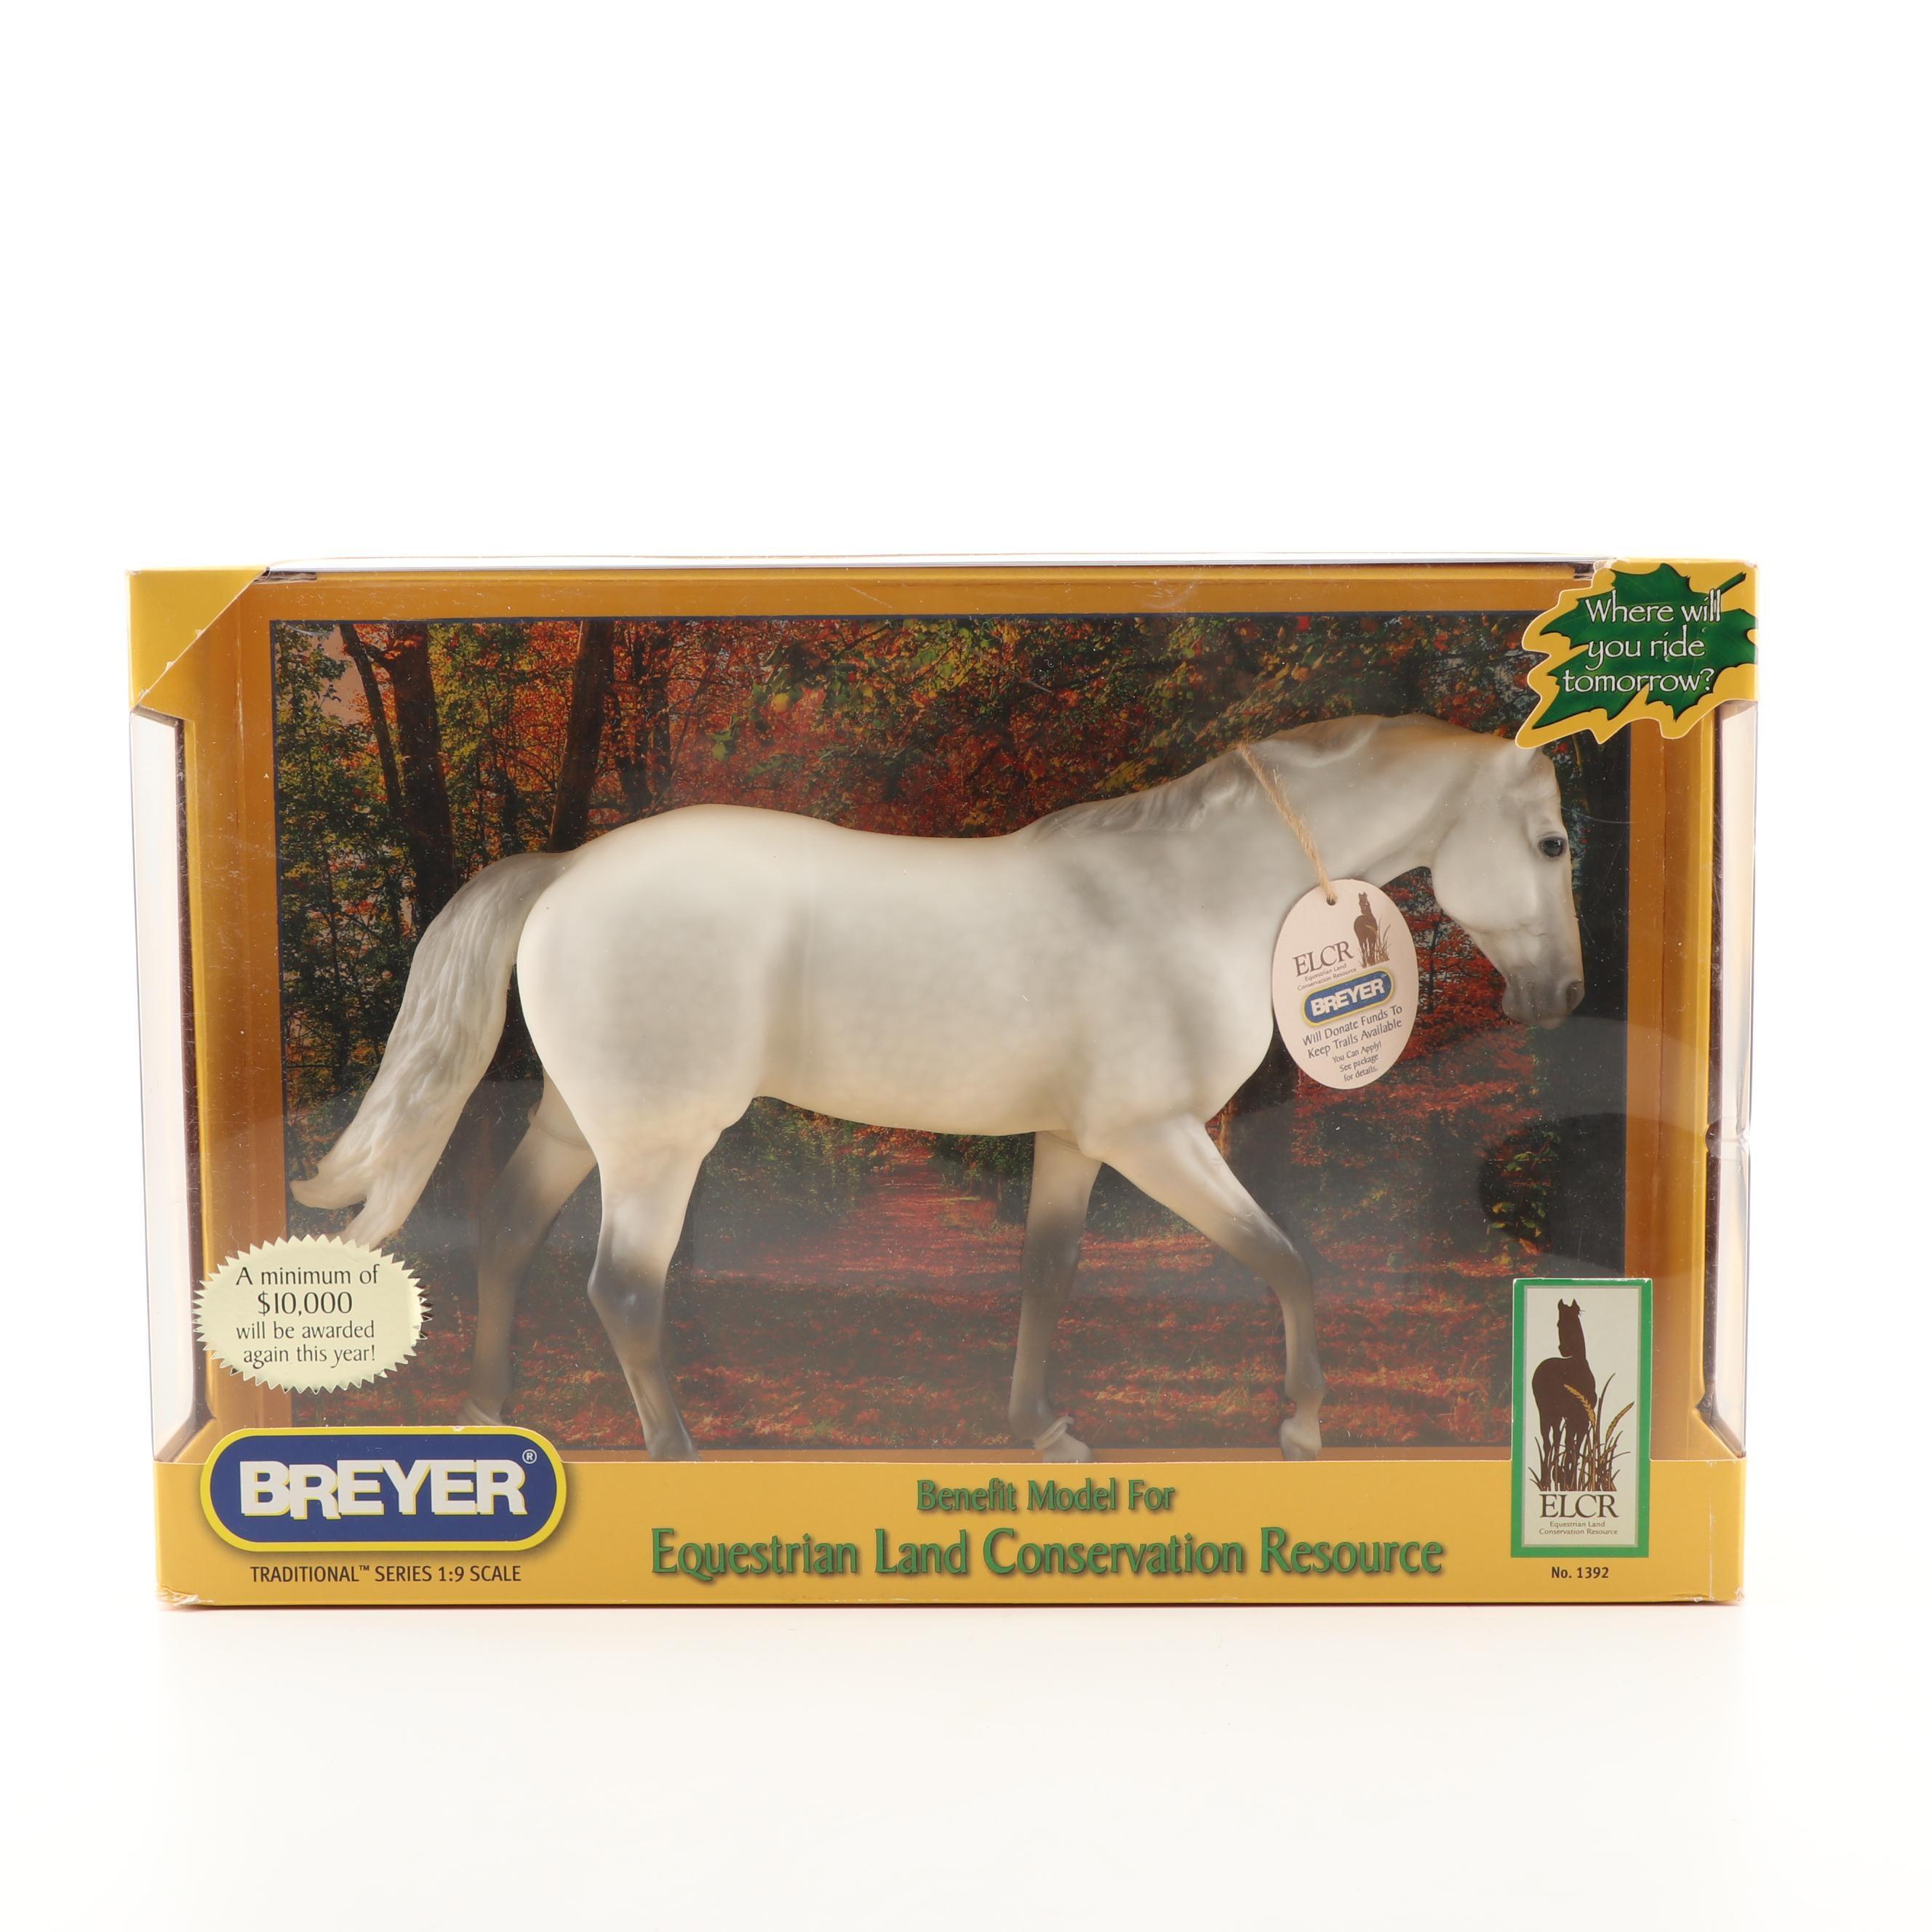 2009 Equestrian Land Conservation Resource Benefit Breyer Model Horse